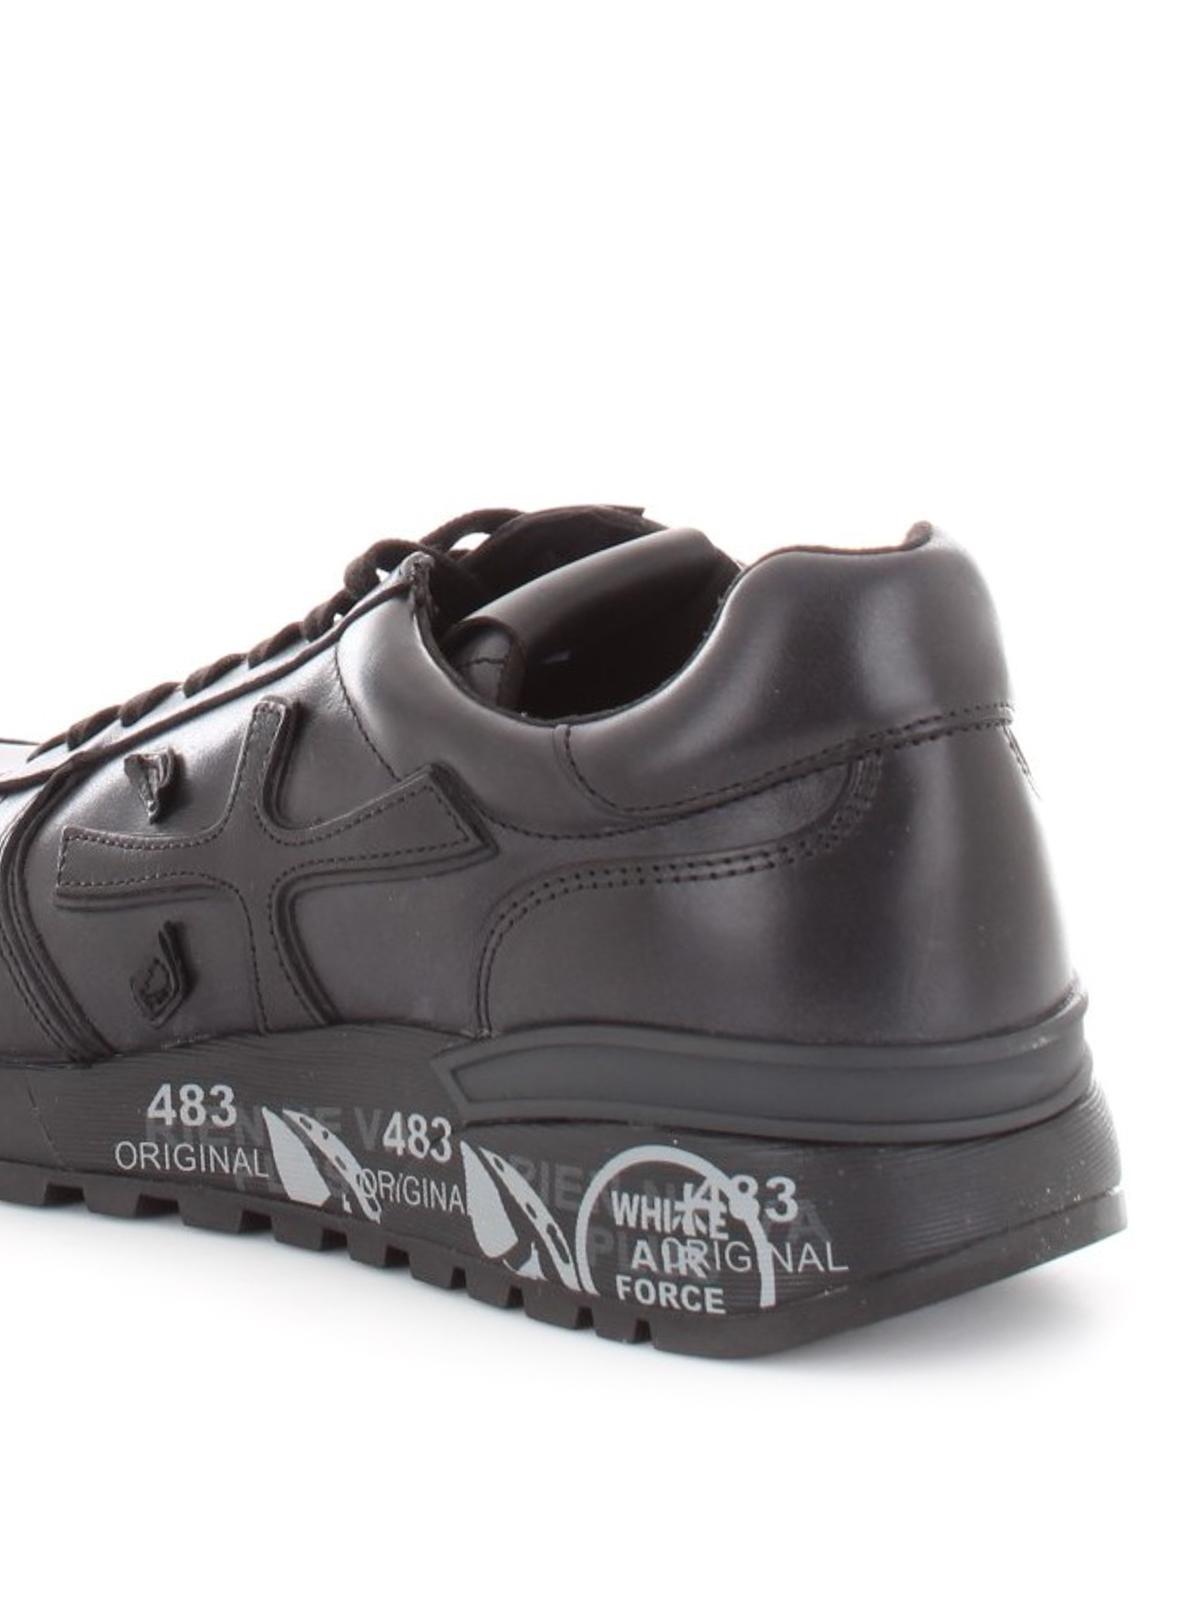 Premiata - Mick leather sneakers